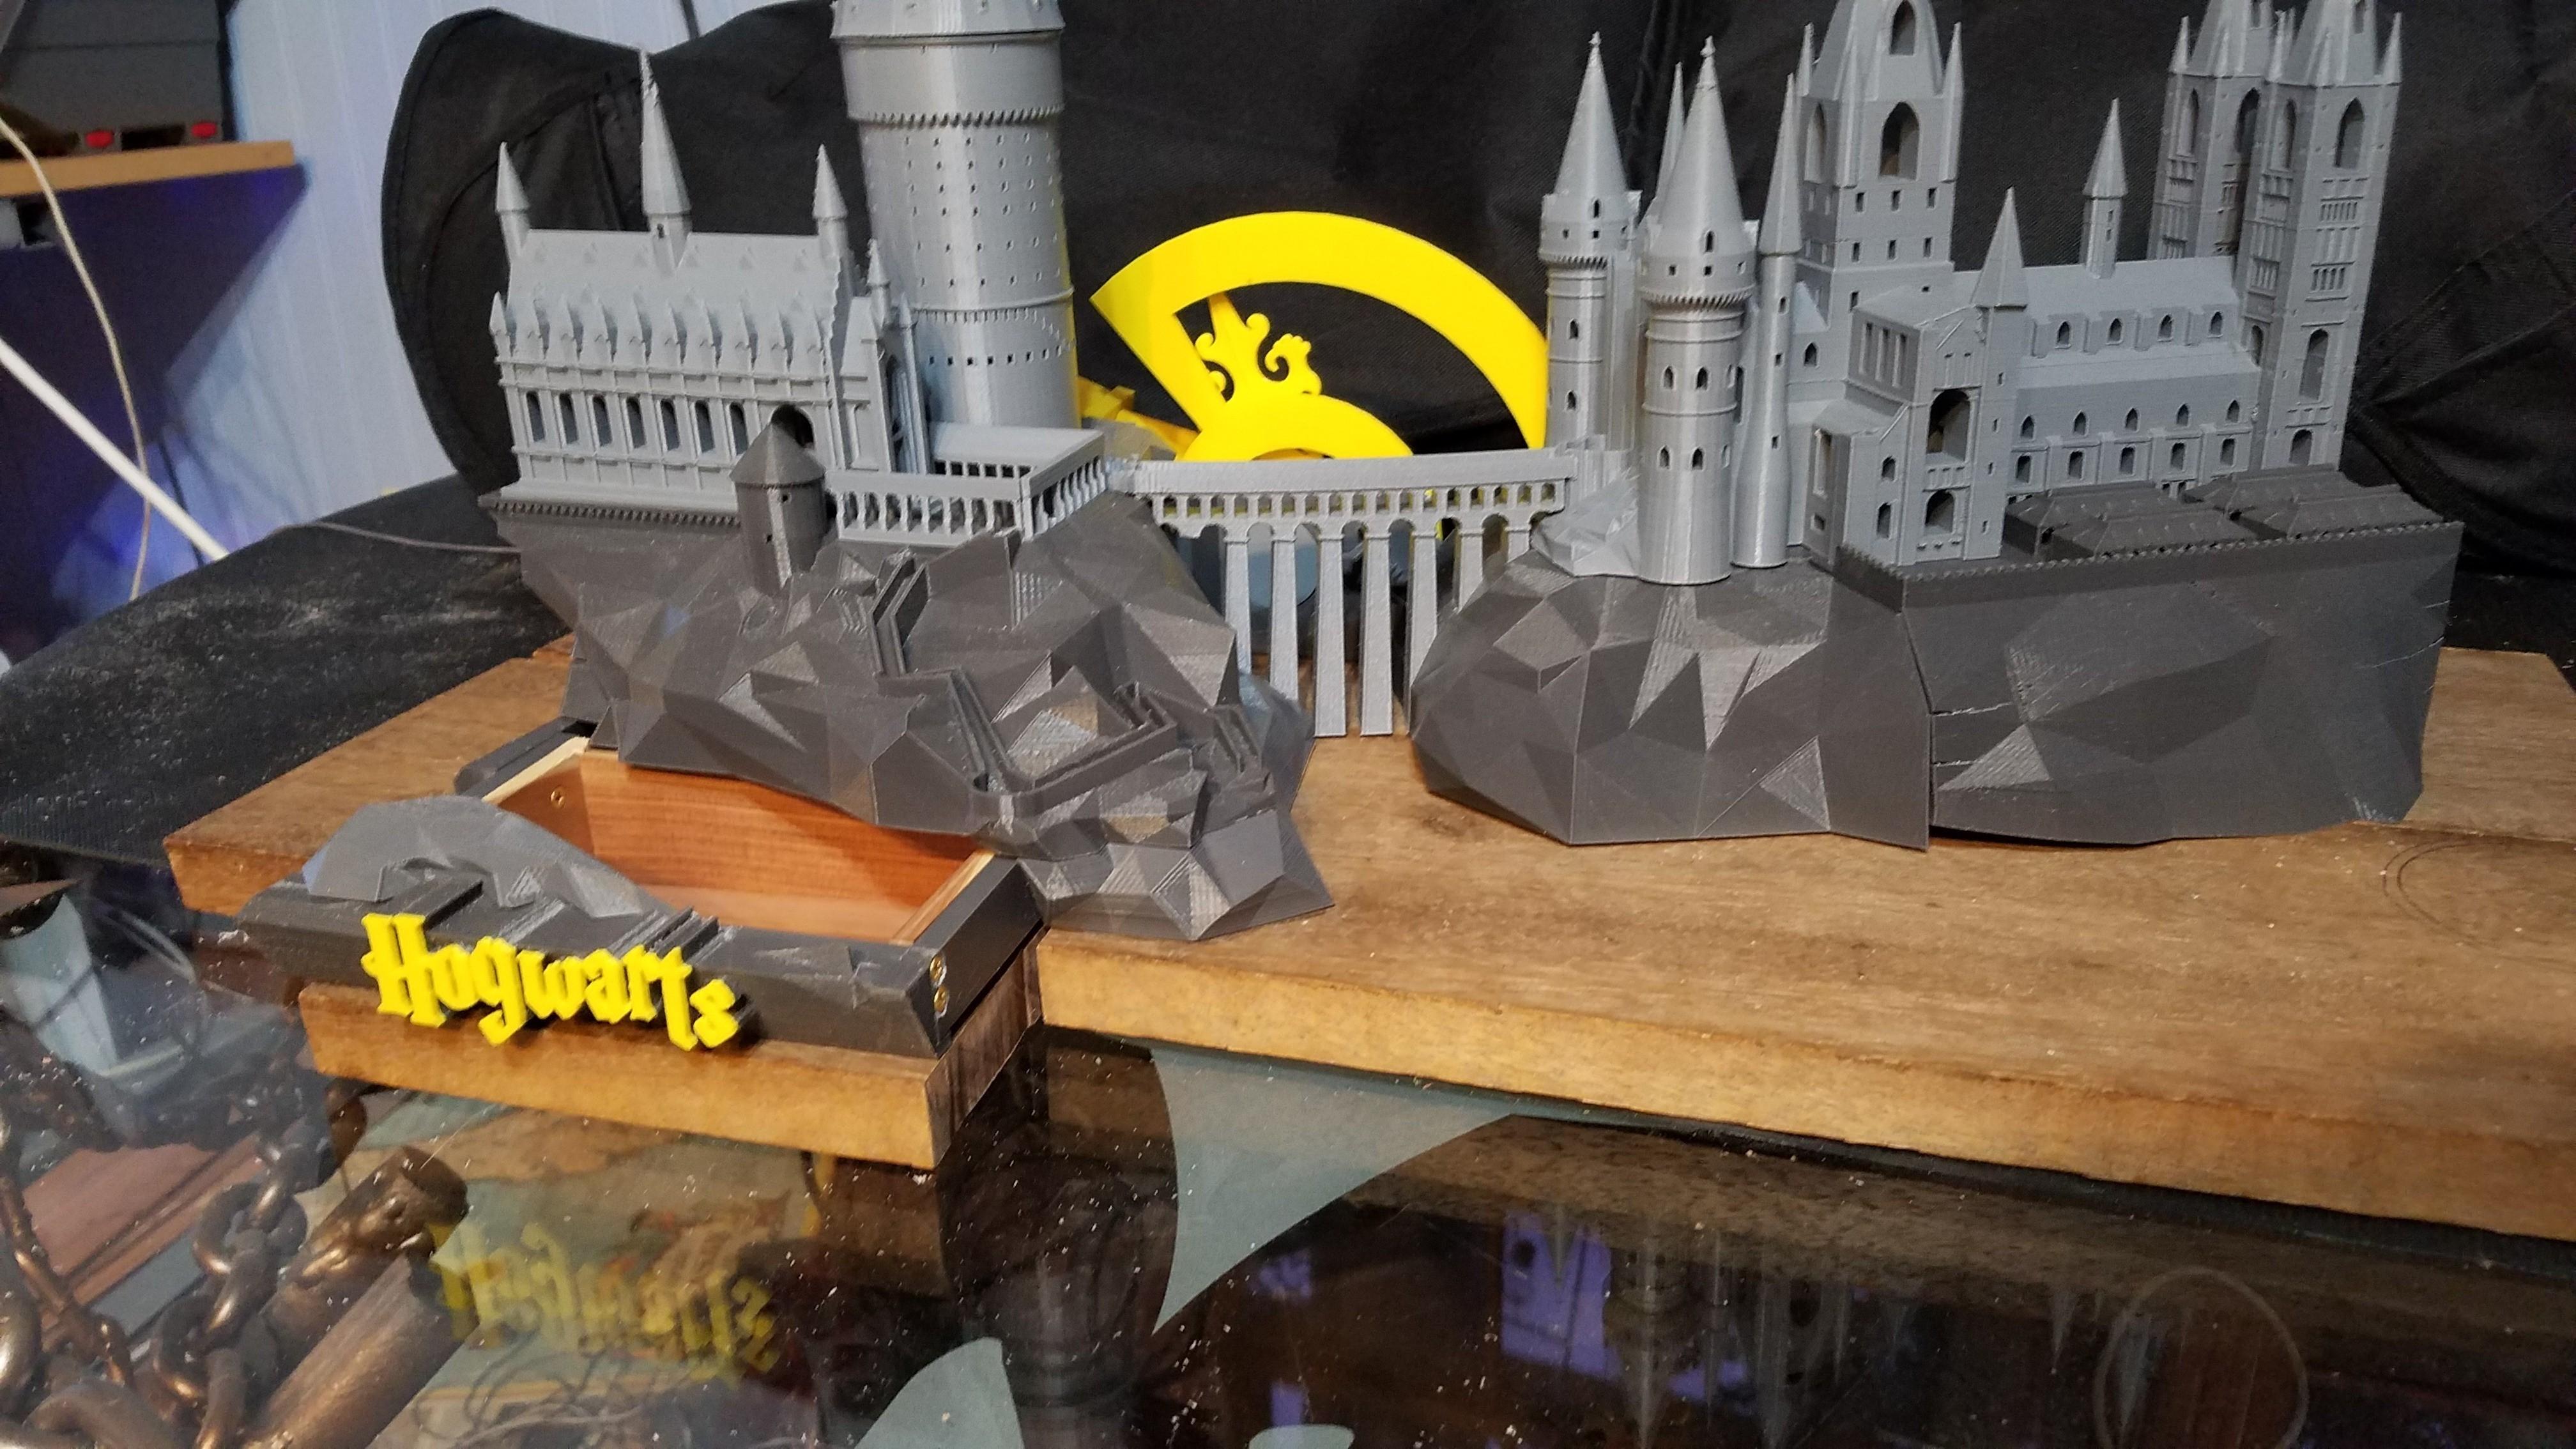 20170614_045143_001.jpg Download free STL file Hogwarts School of Witchcraft • 3D printer template, Valient